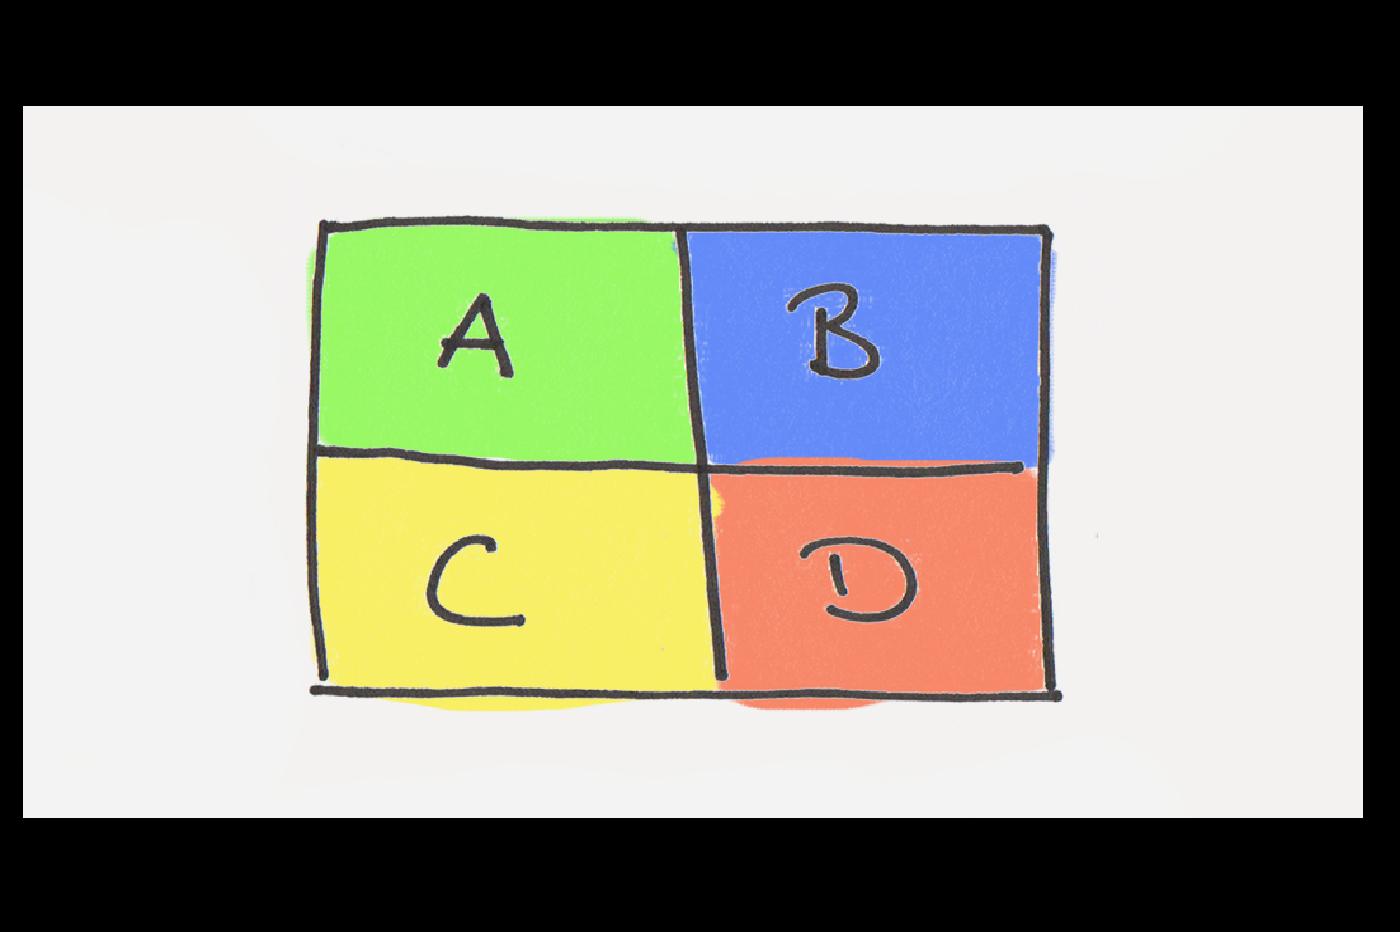 Illusory Correlation: How to Spot This Common Mental Error